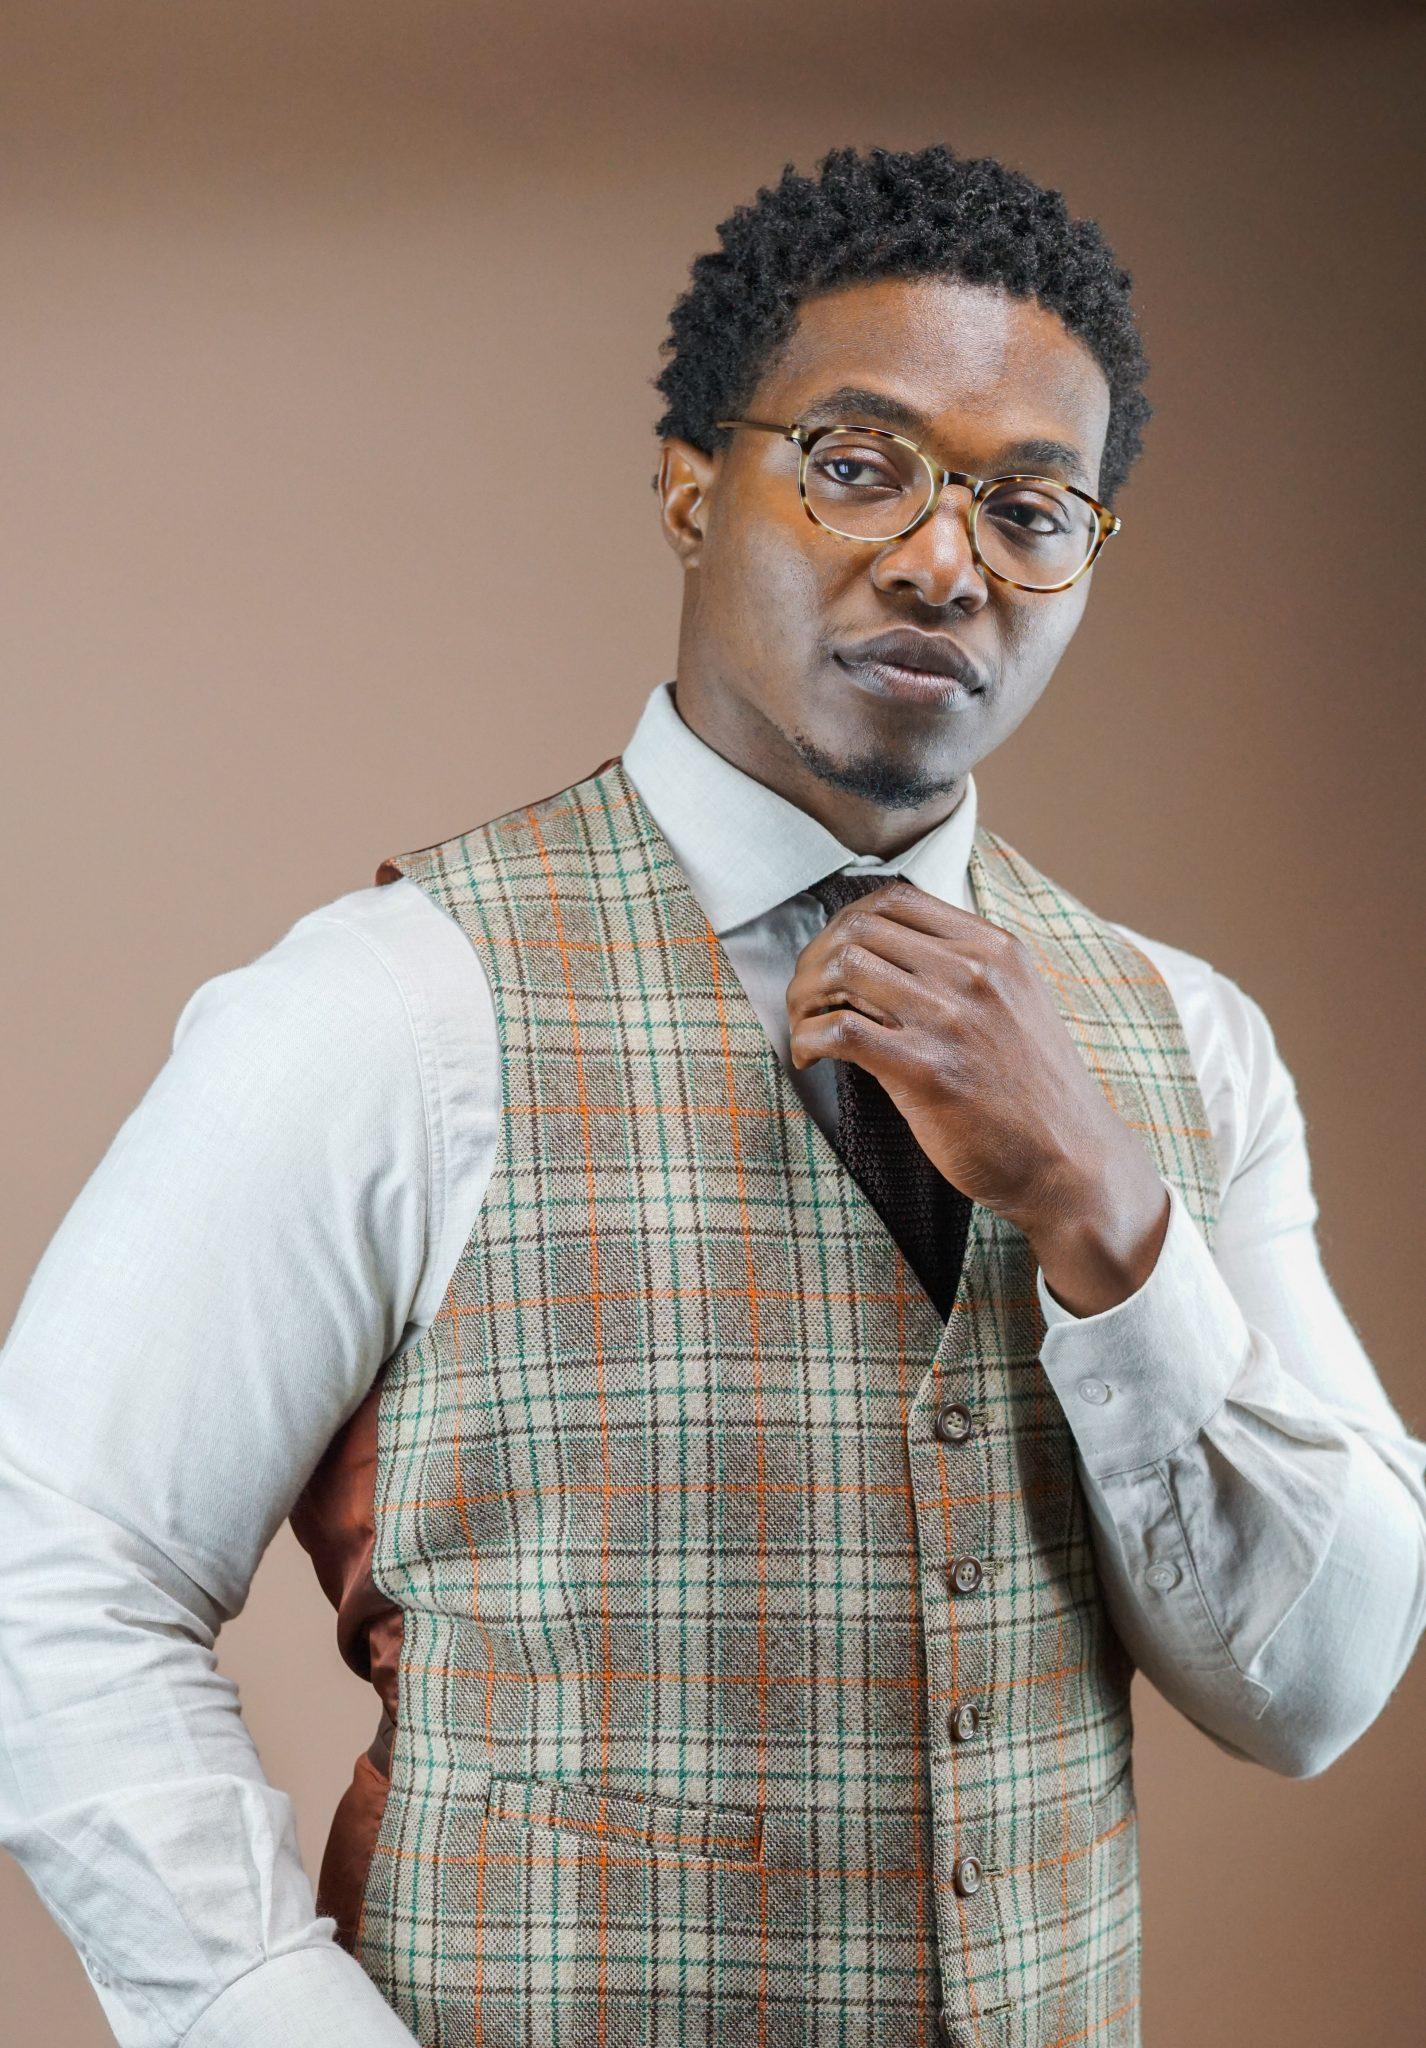 dapper-advisor-casually tailored-plaid-waistcoat-raw-denim-jeans-silk-knit-tie